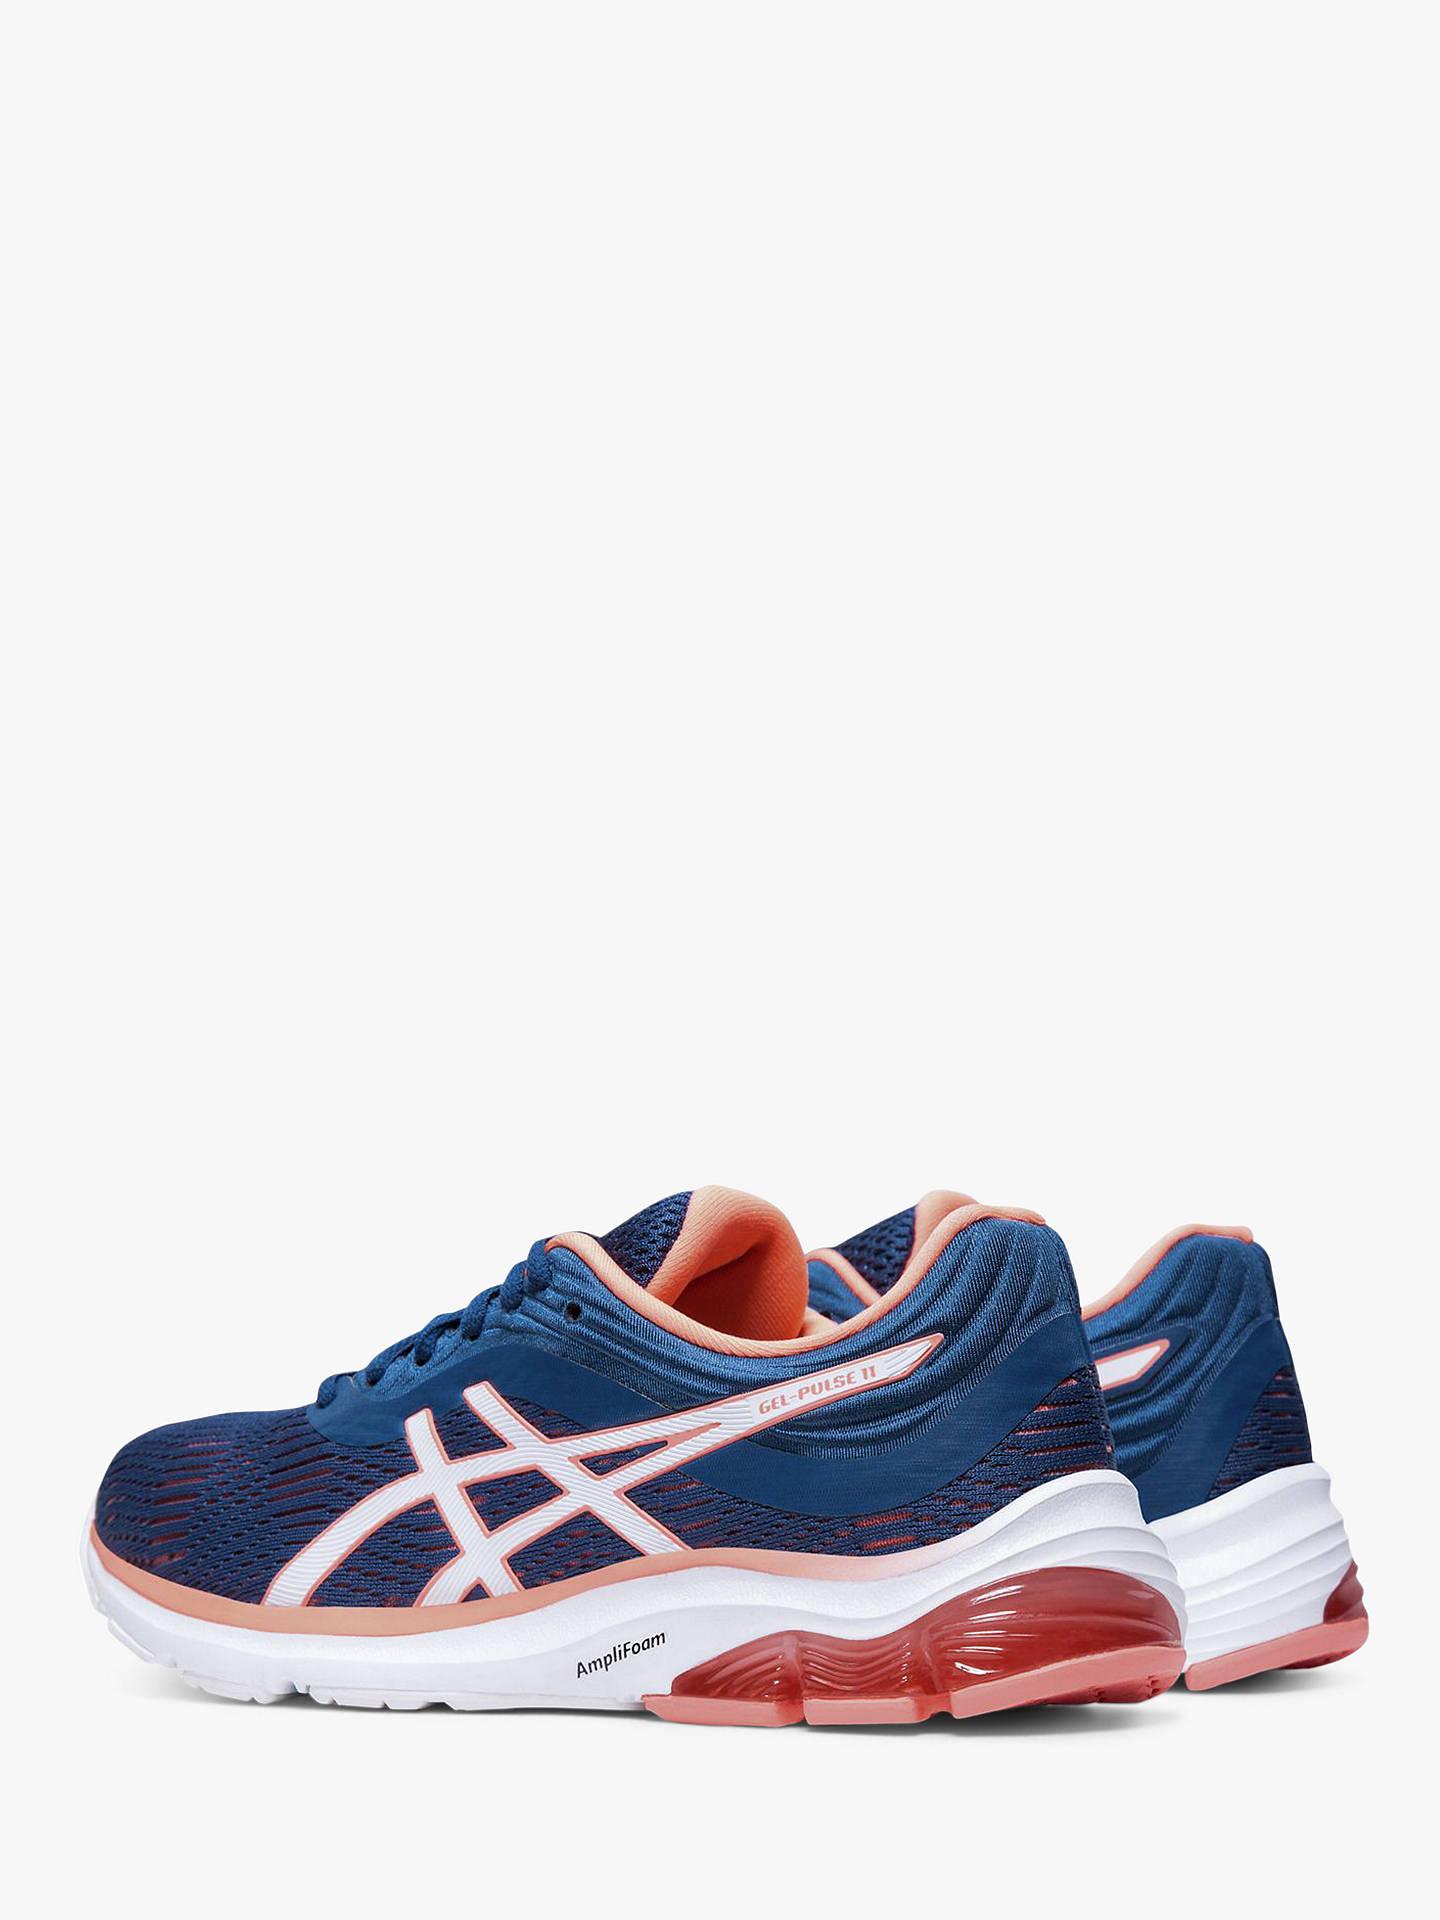 07f8b851 ASICS GEL-PULSE 11 Women's Running Shoes, Mako Blue/Sun Coral